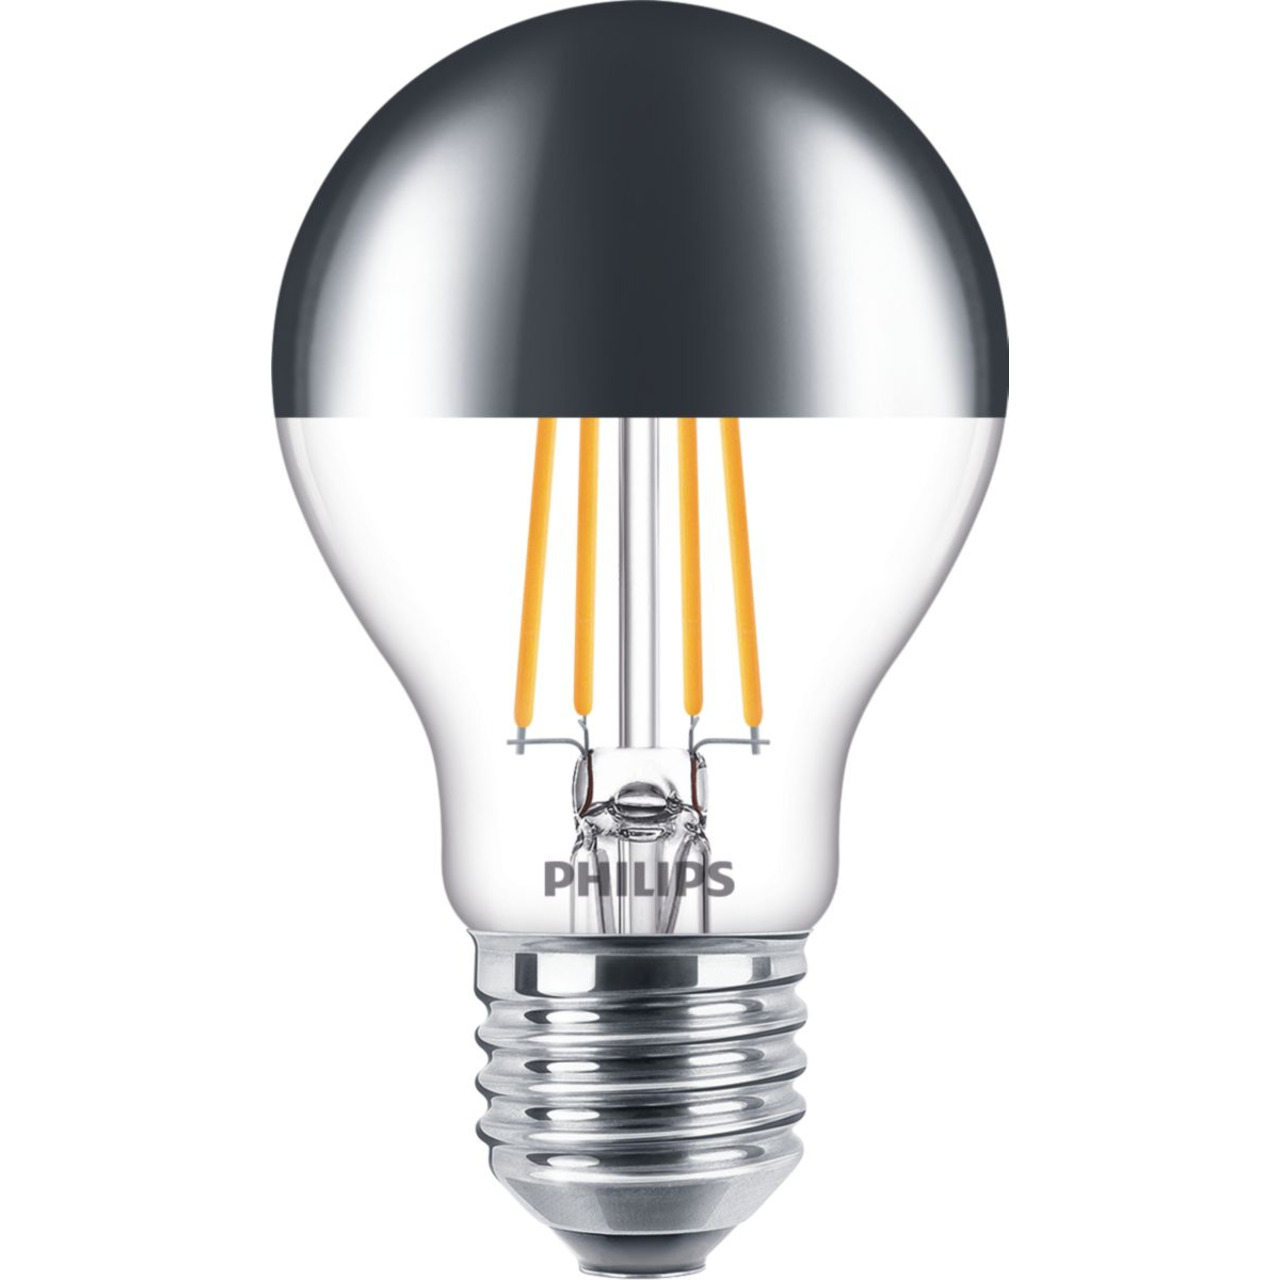 Philips 7-2-W-LED-Spiegelkopflampe E27- dimmbar- warmweiss